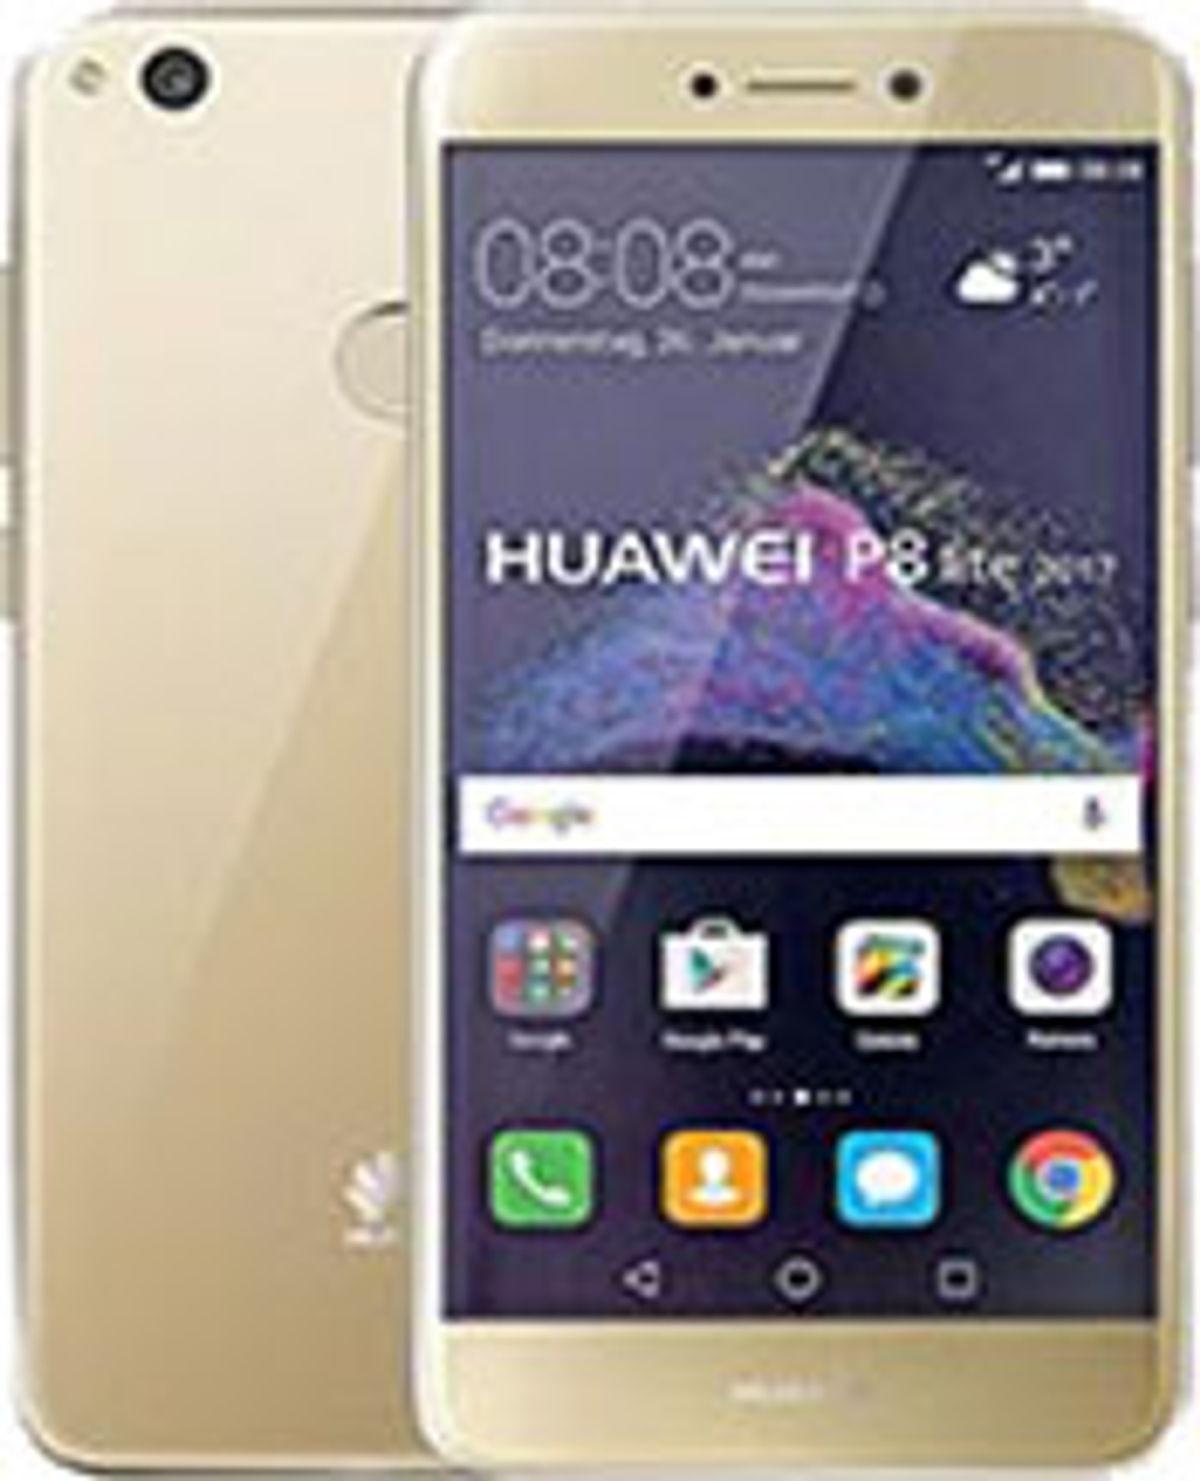 Best Huawei Phones Under 15000 - September 2019 in India